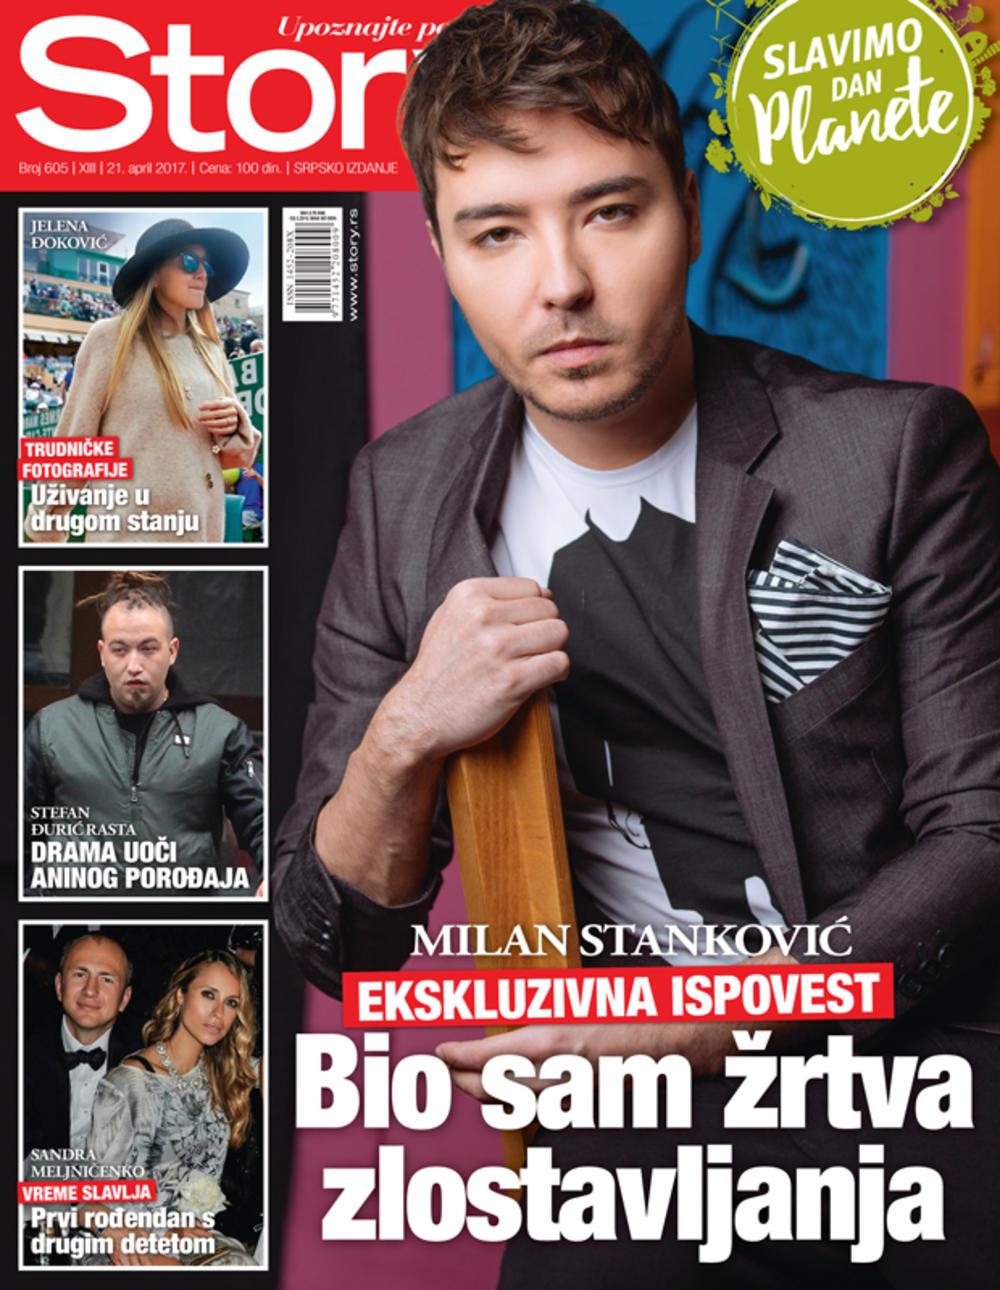 Milan-Stankovic-Bio-sam-zrtva-zlostavljanja